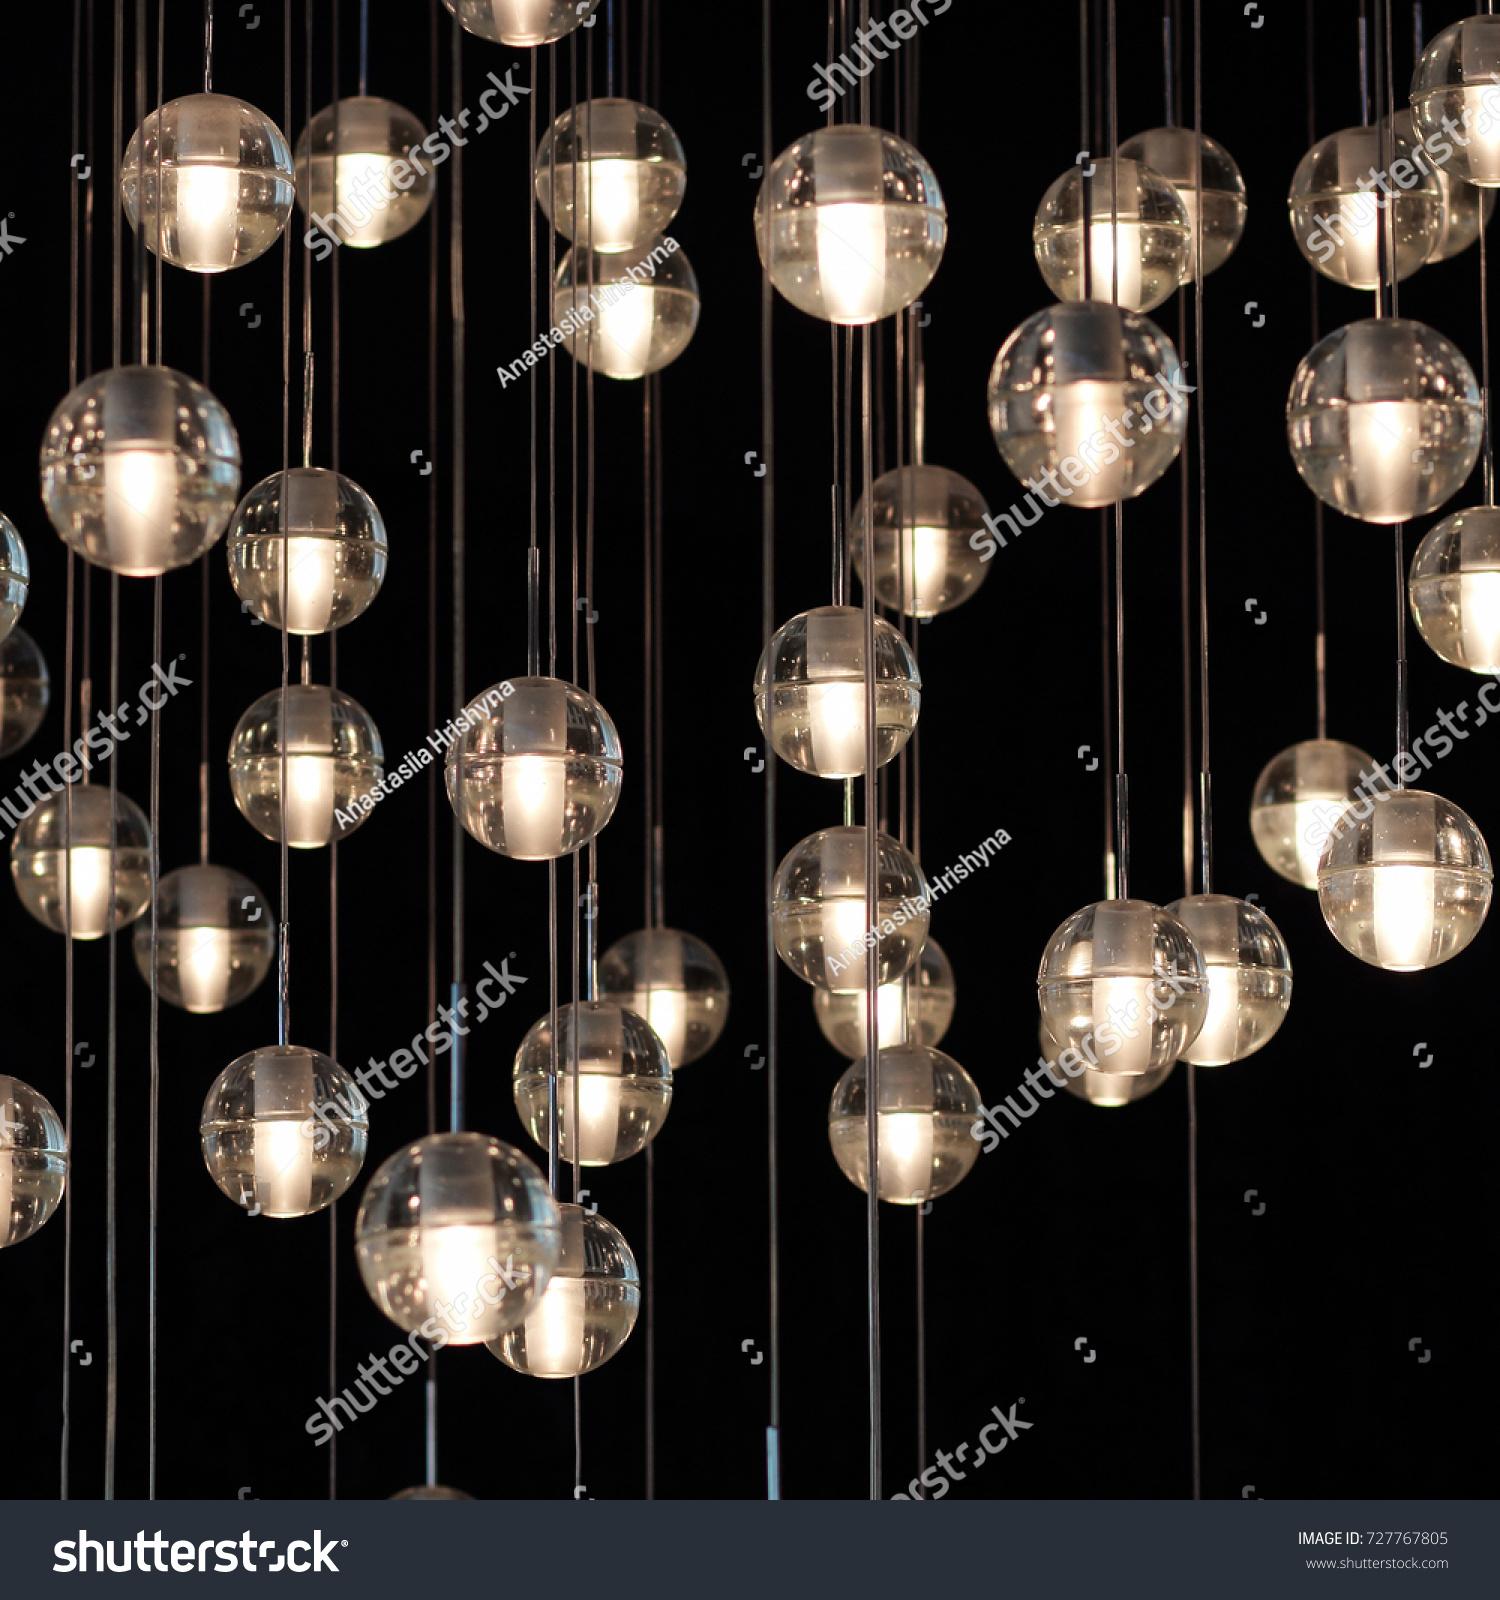 Lighting balls on chandelier lamplight light stock photo royalty lighting balls on the chandelier in the lamplight light bulbs hanging from the ceiling aloadofball Image collections